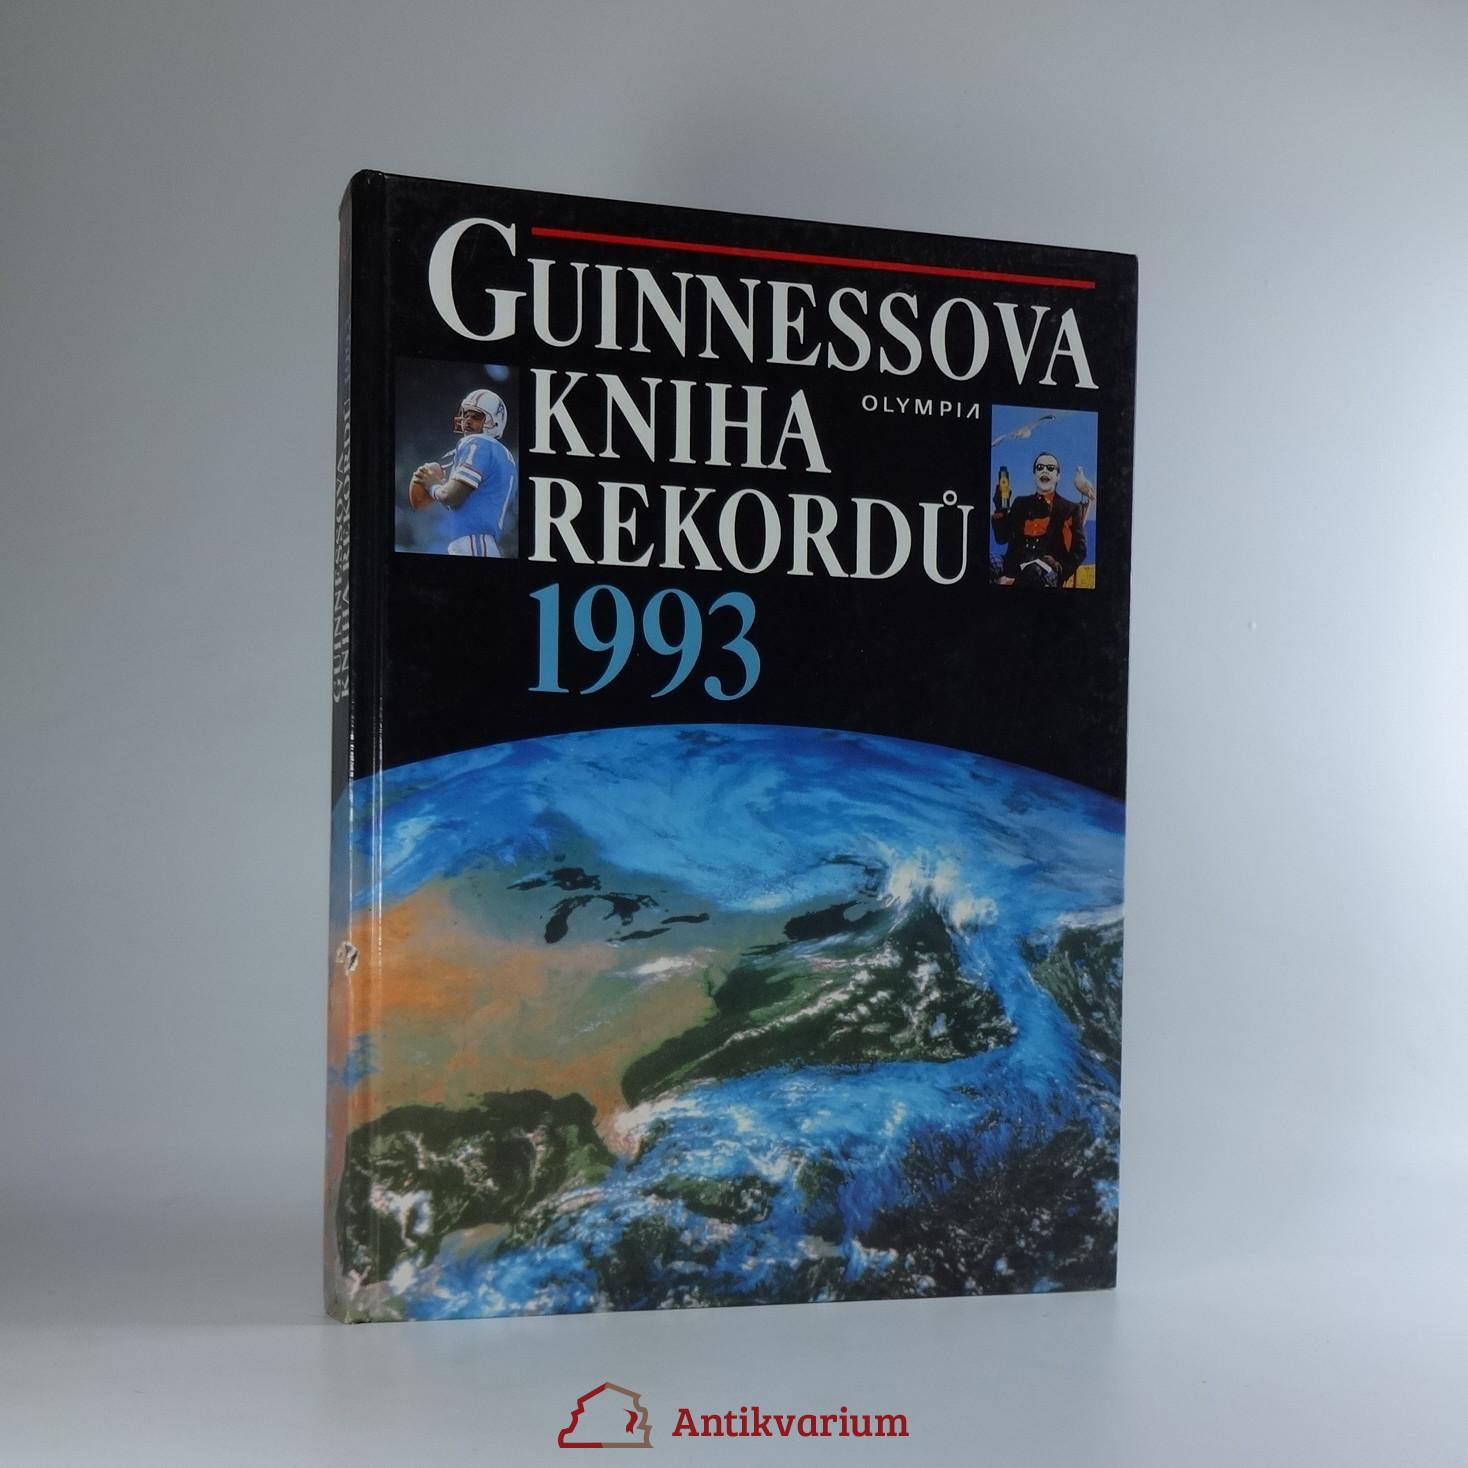 antikvární kniha Guinnessova kniha rekordů. 1993, 1993